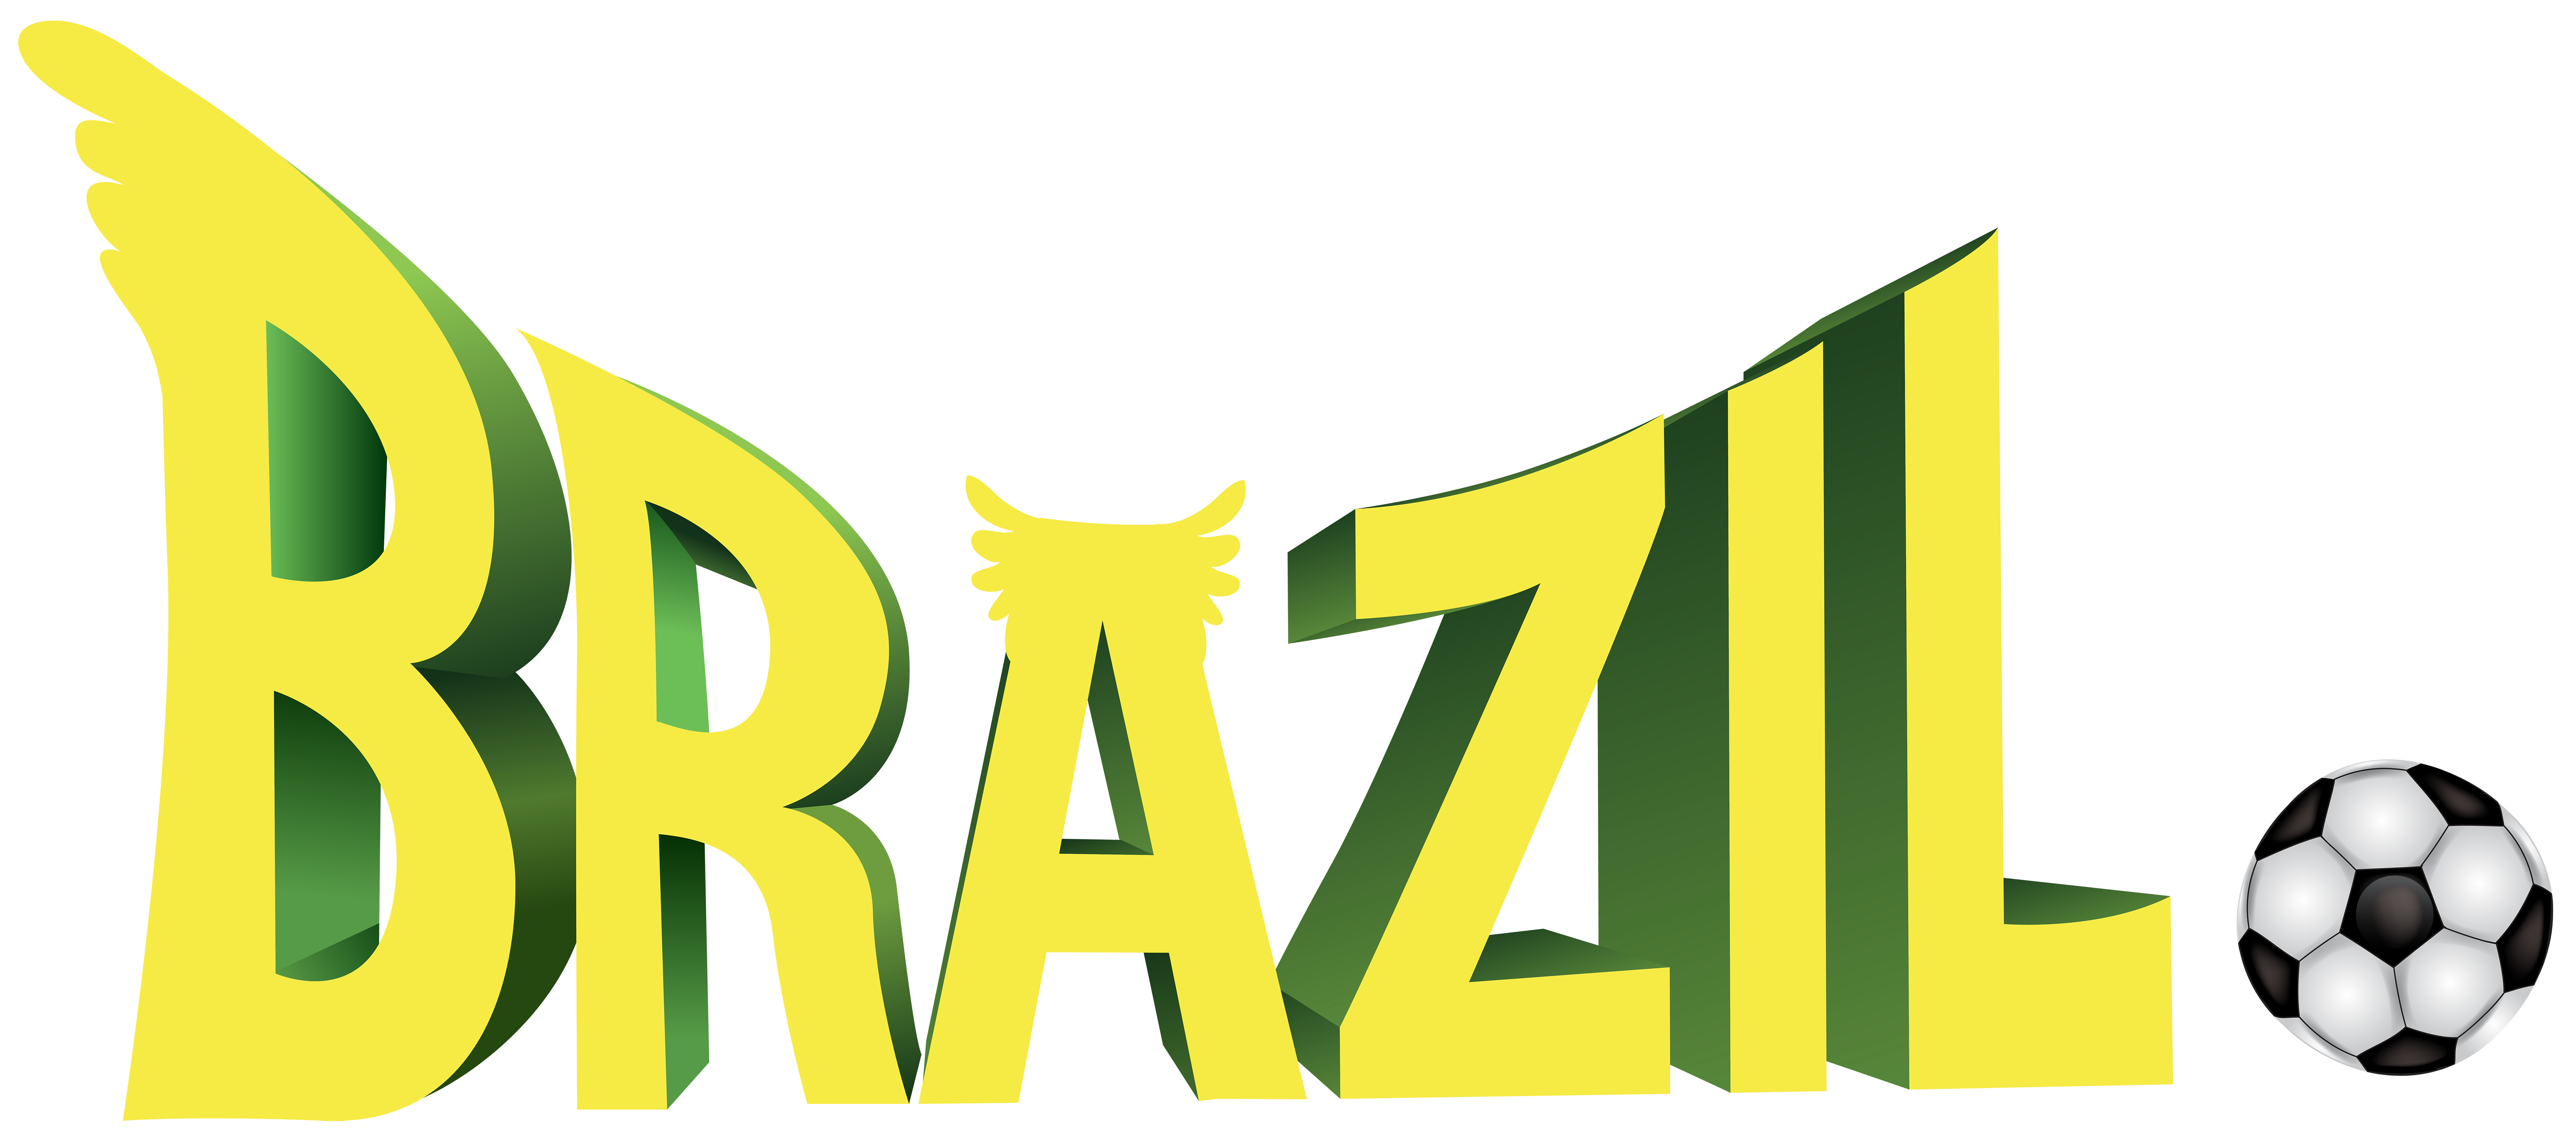 7000x3070 Brazil Soccer Png Clip Art Imageu200b Gallery Yopriceville